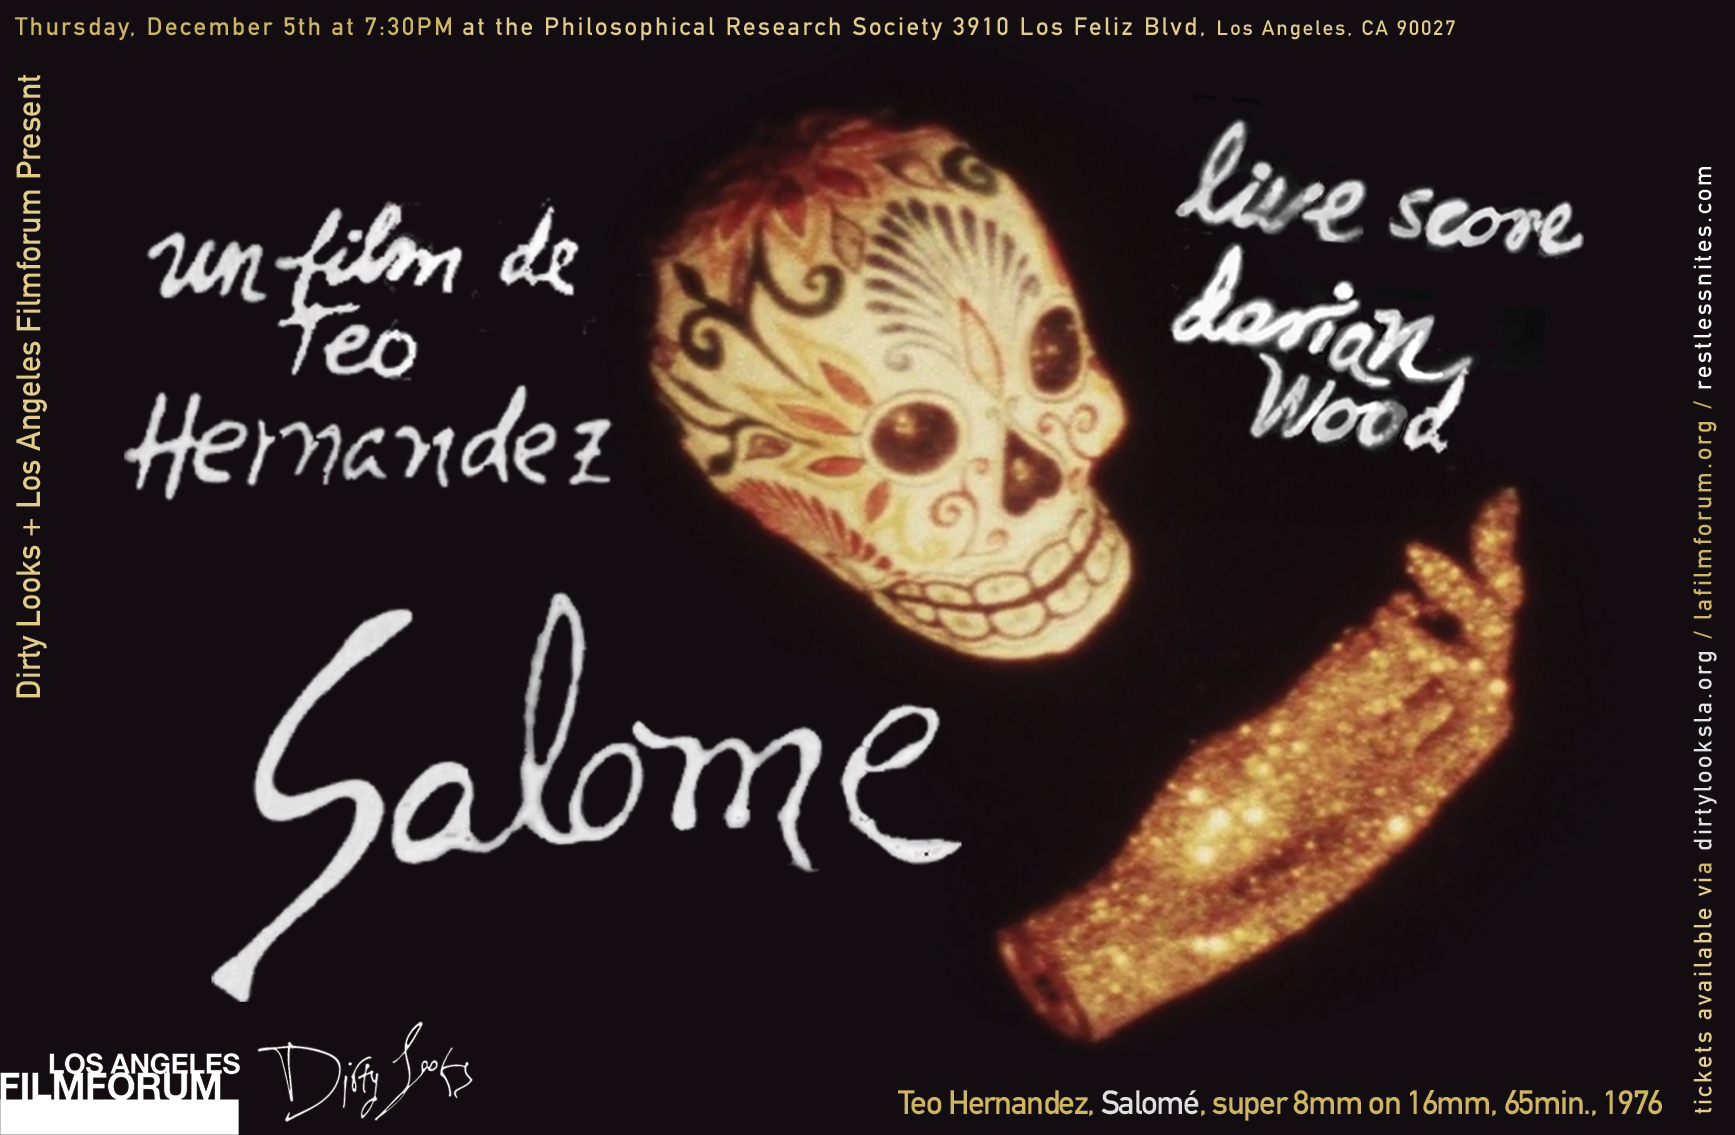 Salomé, a film by Teo Hernandez. Live score by Dorian Wood